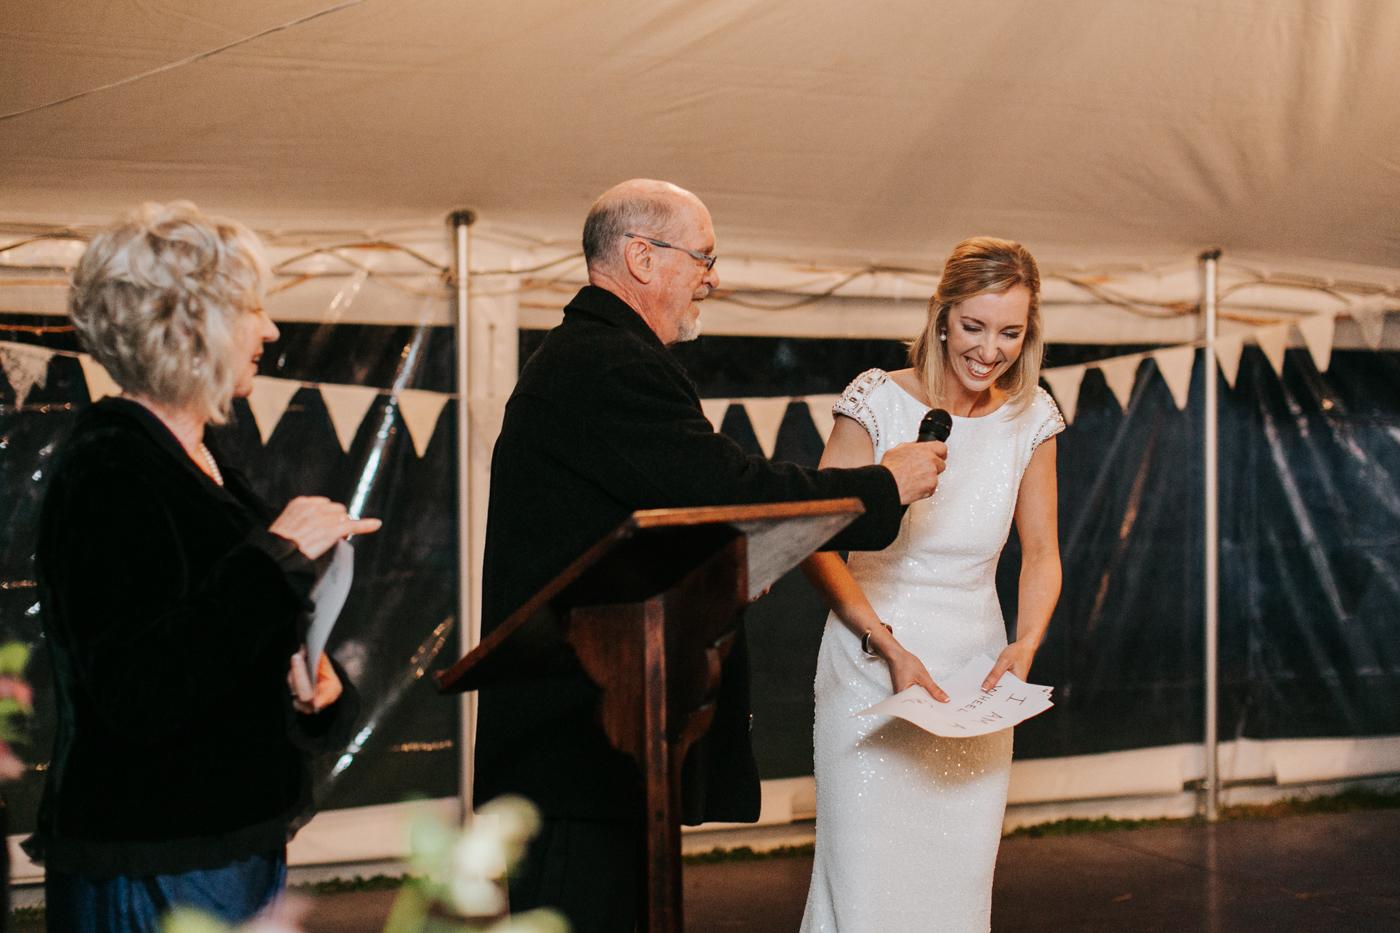 Bridget & James - Orange Country Wedding - Samantha Heather Photography-218.jpg